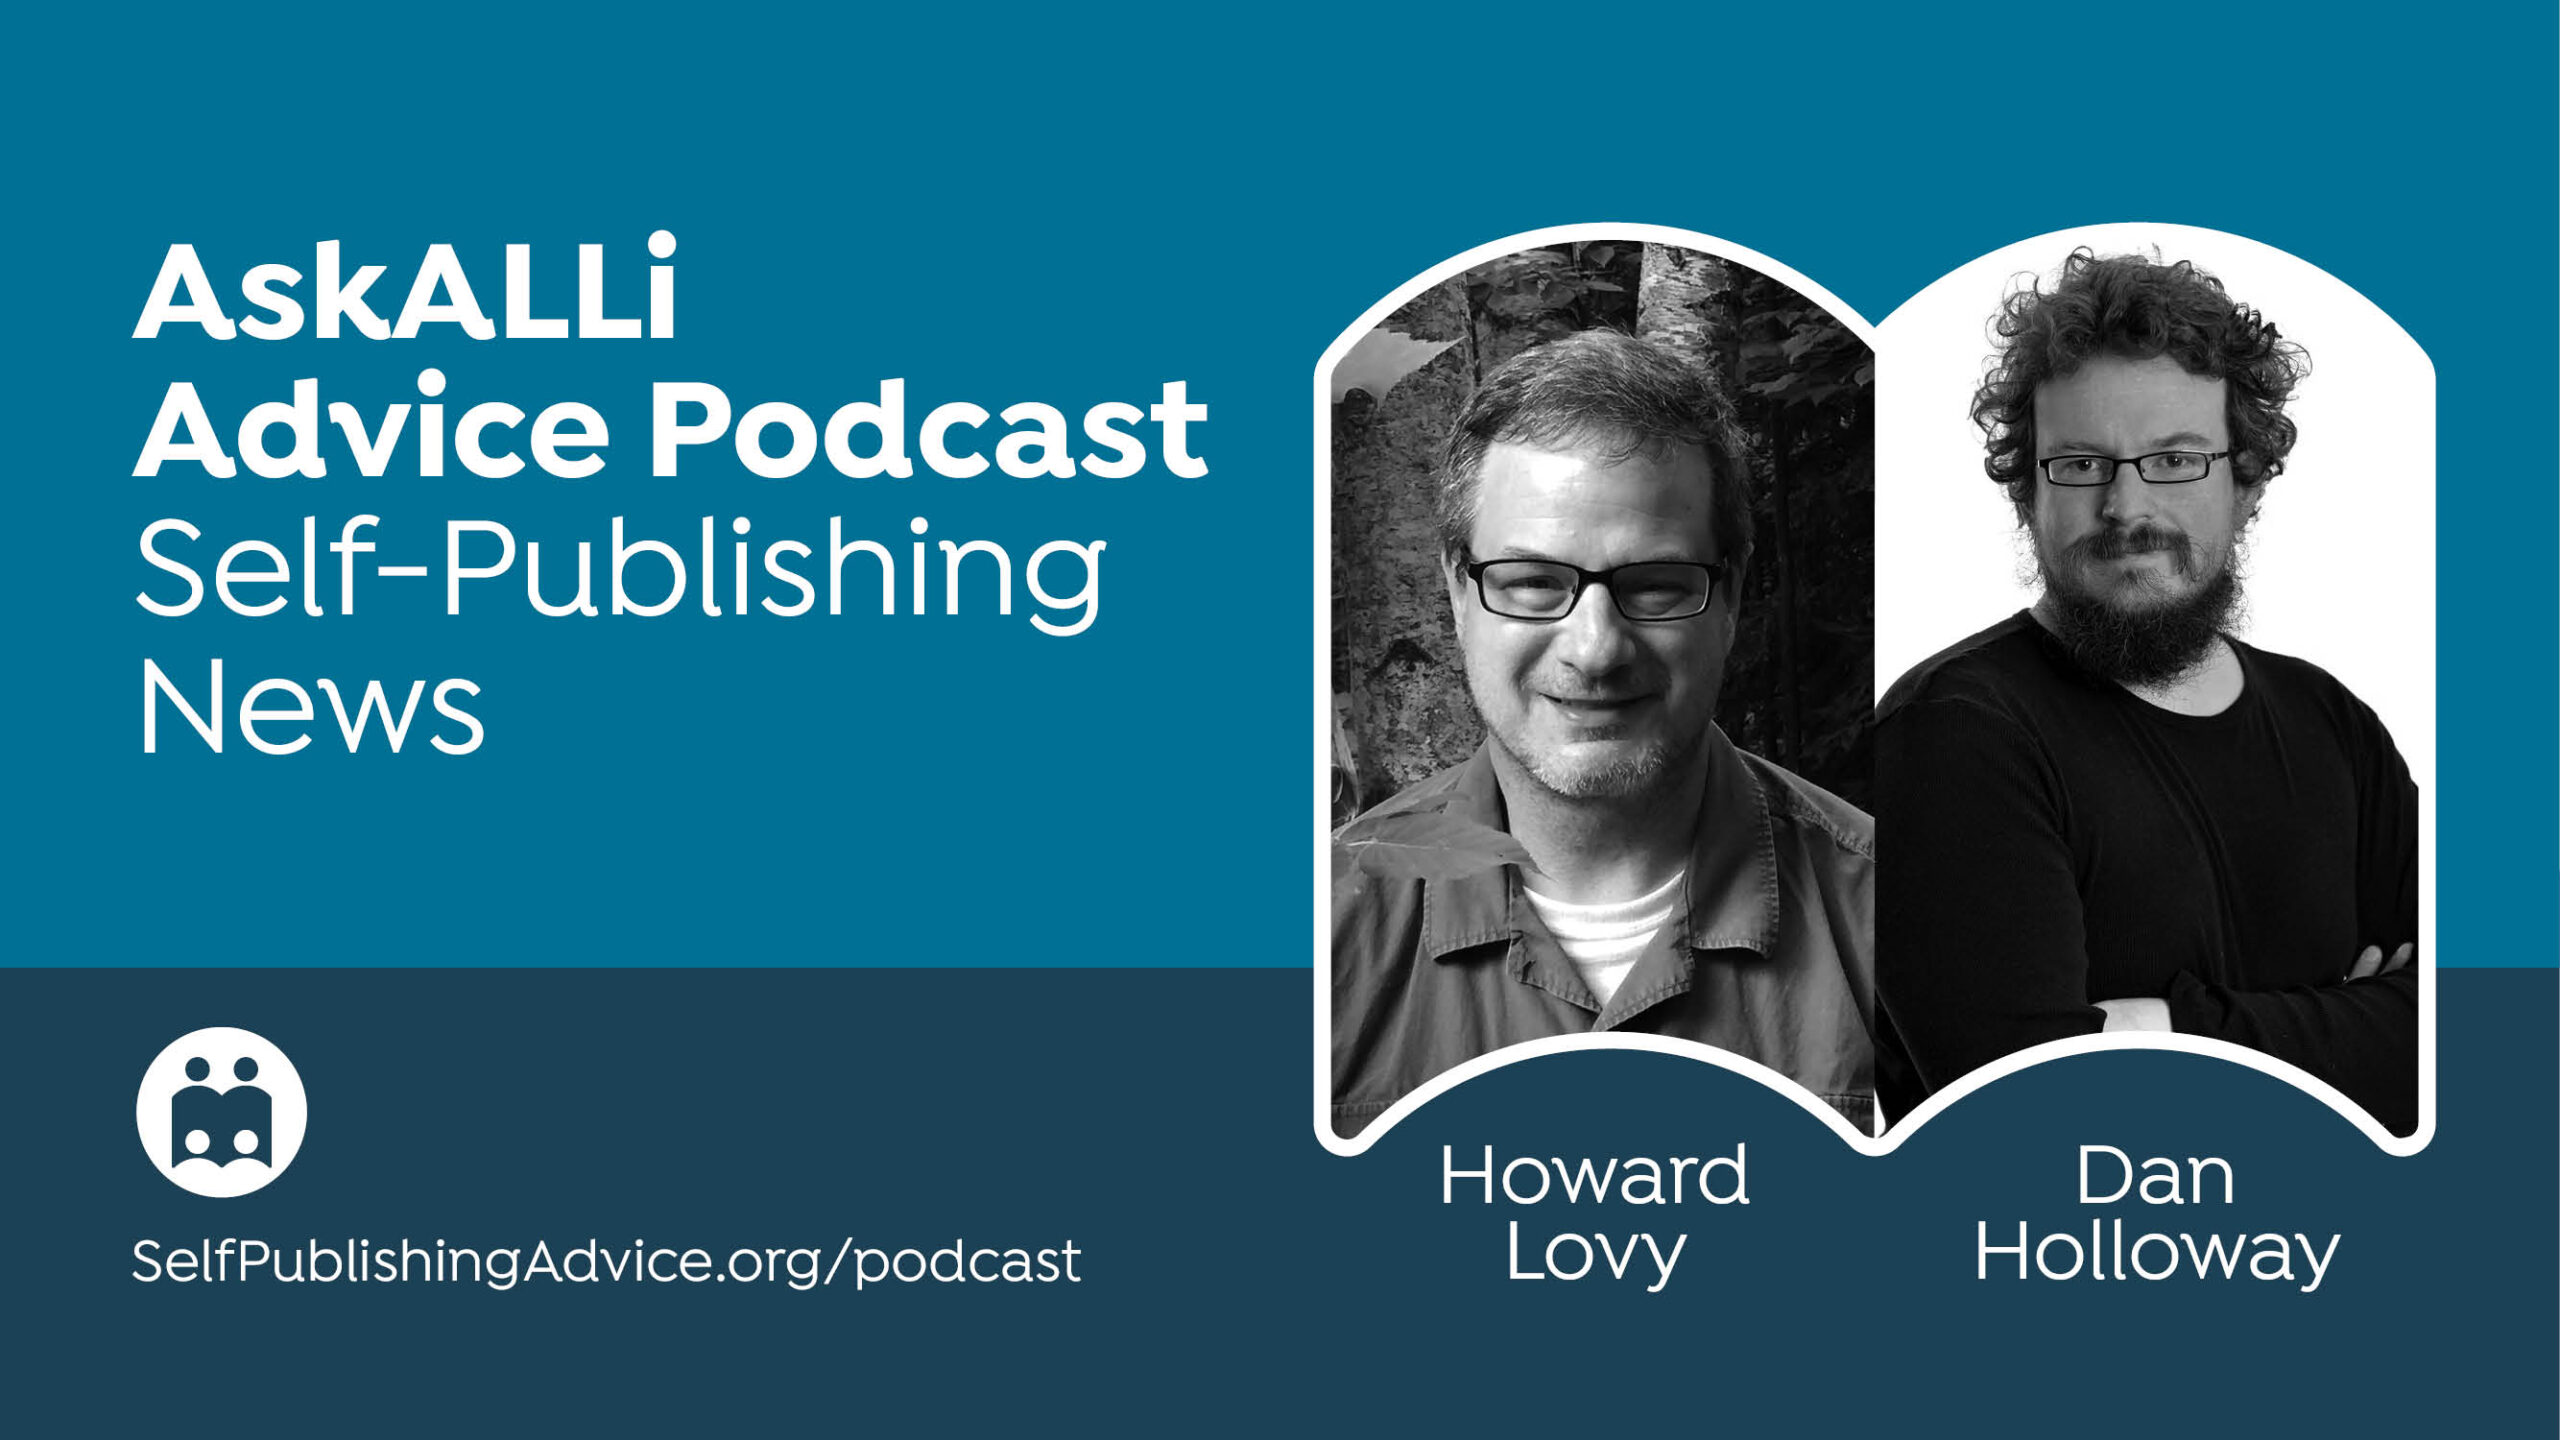 PODCAST: Self-Publishing News Podcast